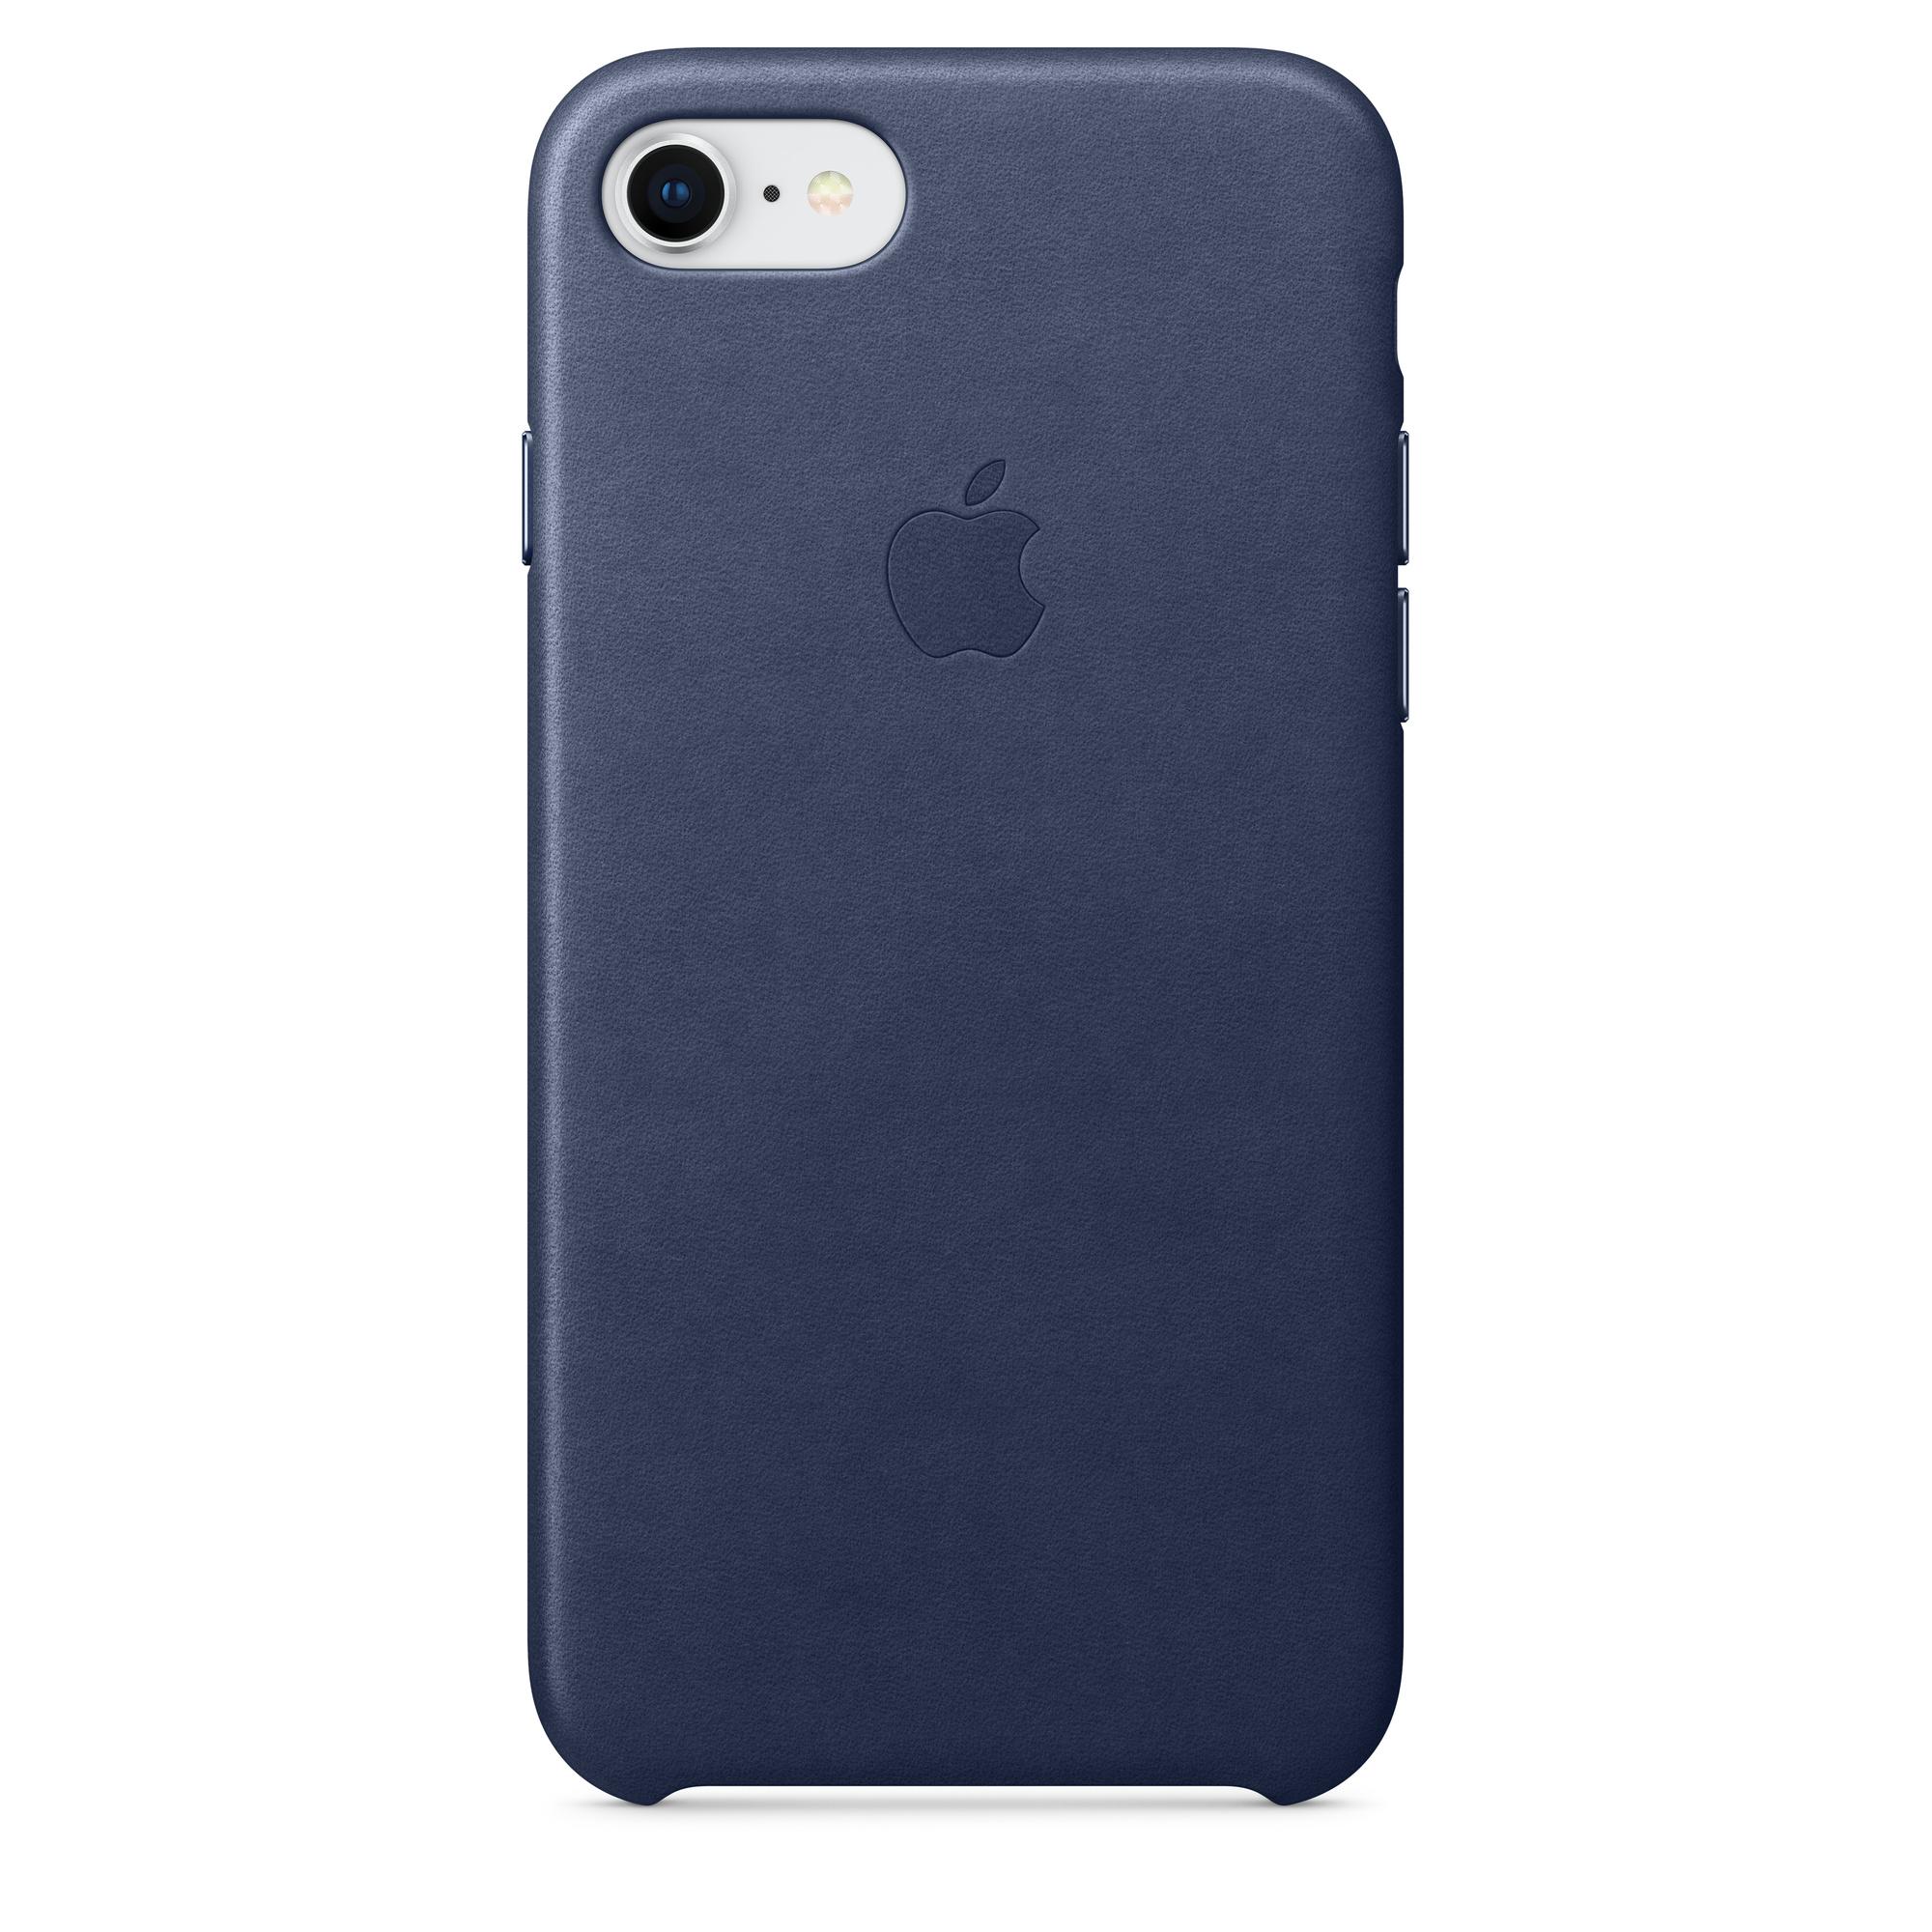 san francisco 09e8e 49e50 iPhone 8 / 7 Leather Case - Midnight Blue